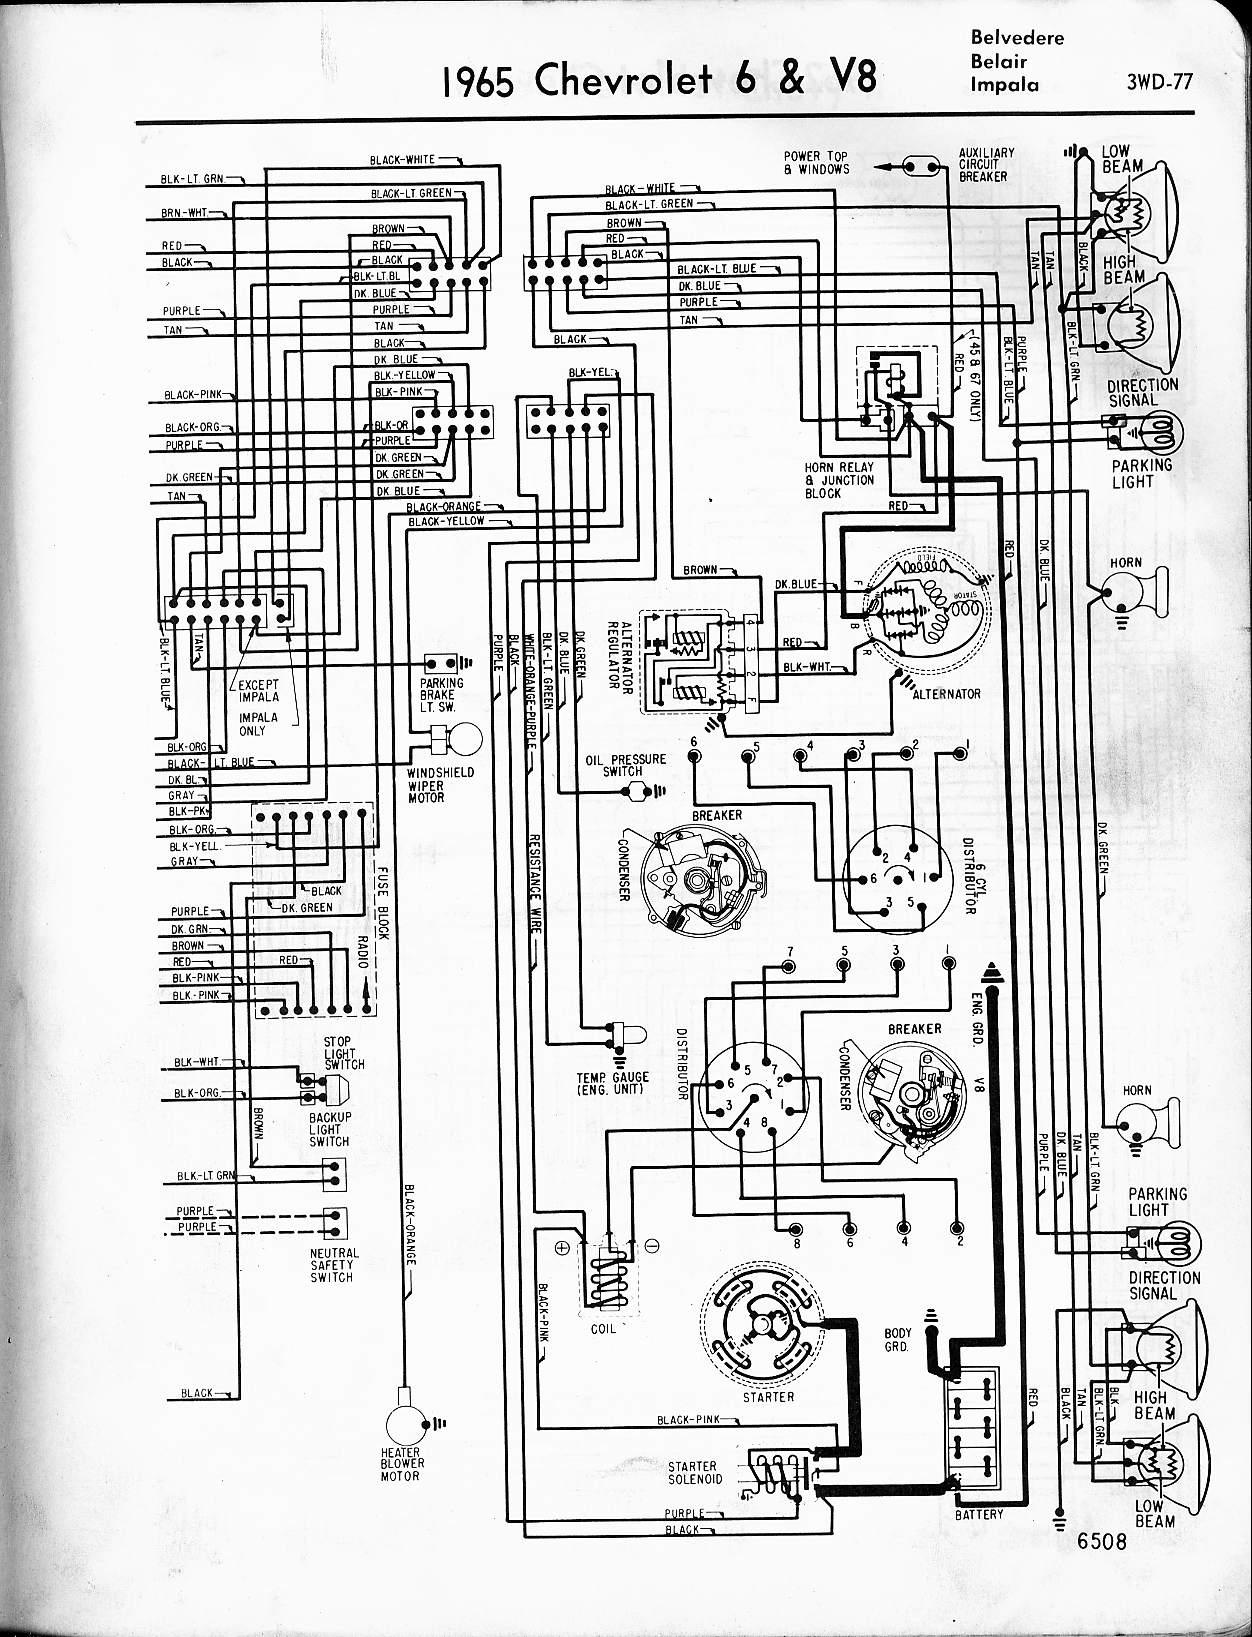 Admirable 1967 Chevelle Wiring Diagram Basic Electronics Wiring Diagram Wiring Cloud Waroletkolfr09Org